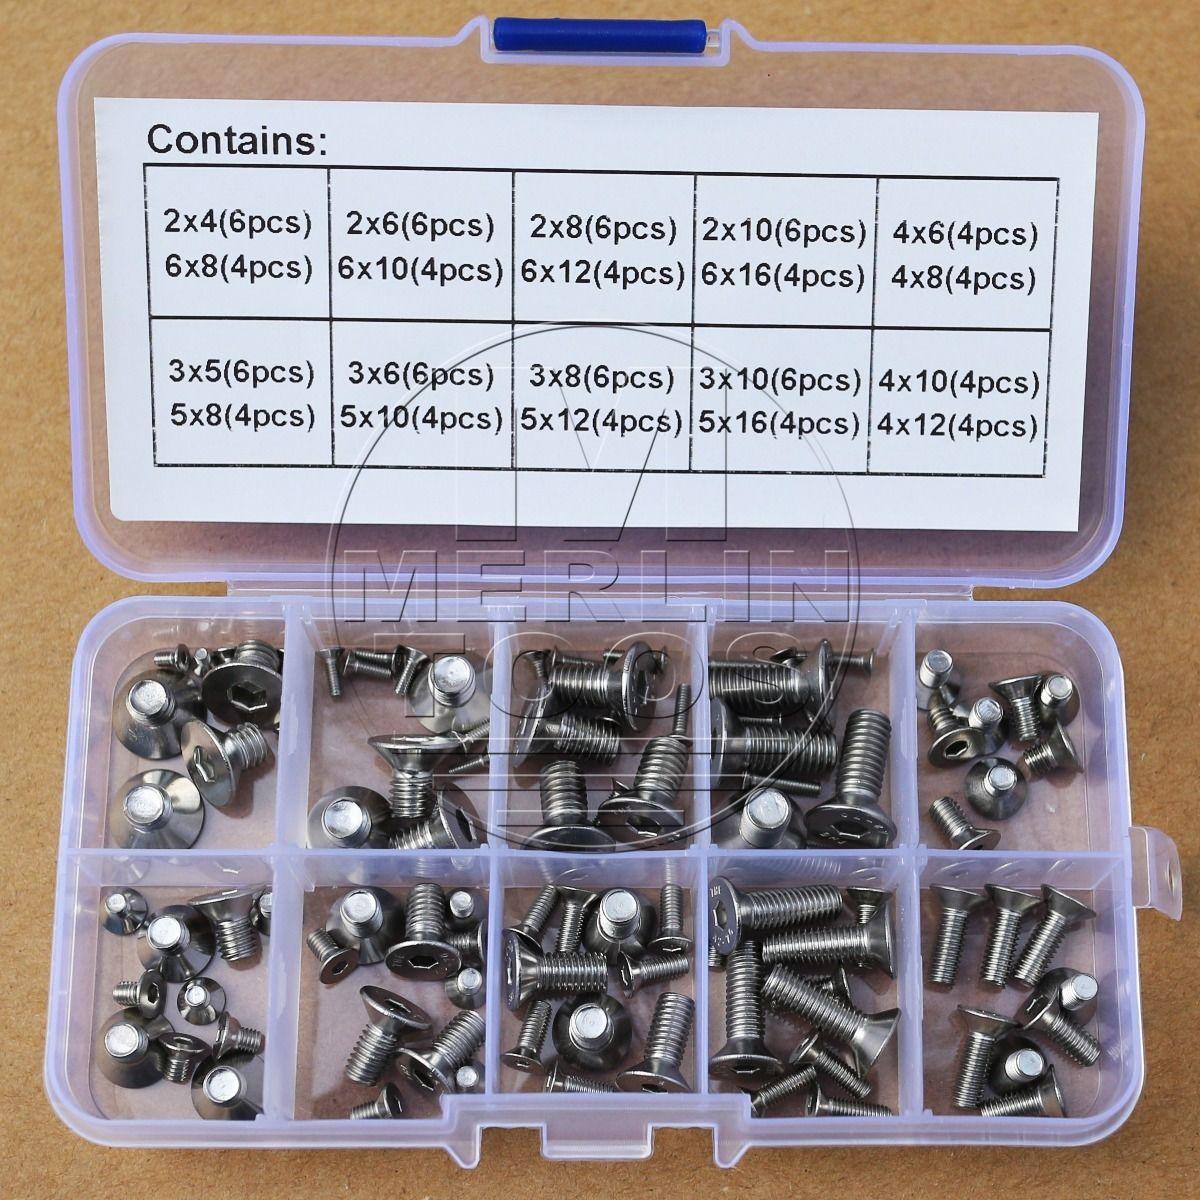 M2 M3 M4 M5 M6 Stainless Steel Allen Flat Head Socket Cap Screws Assortment Kit недорого